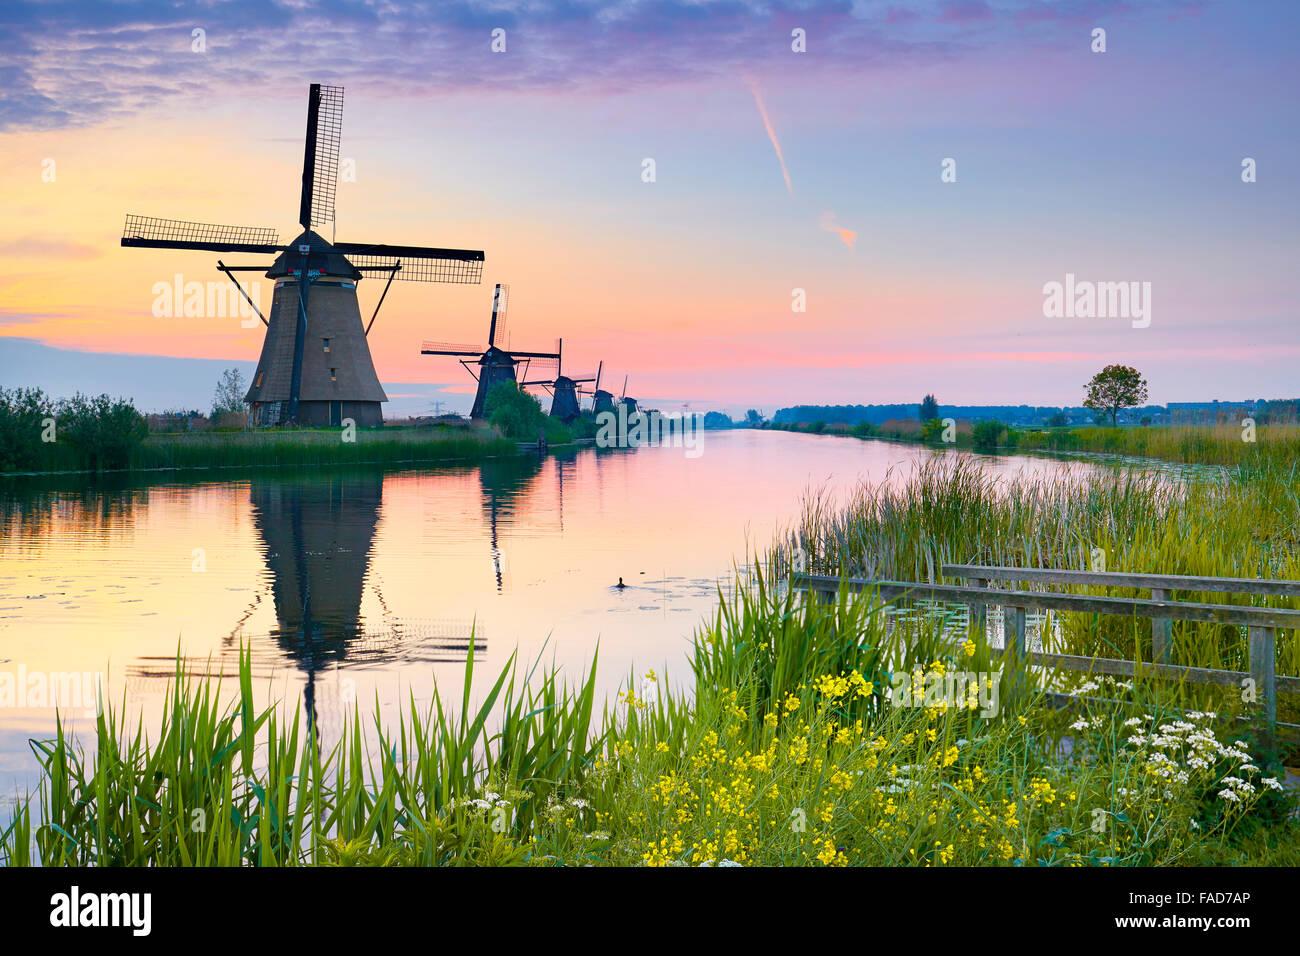 Netherlands windmill, Kinderdijk, Holland - Stock Image